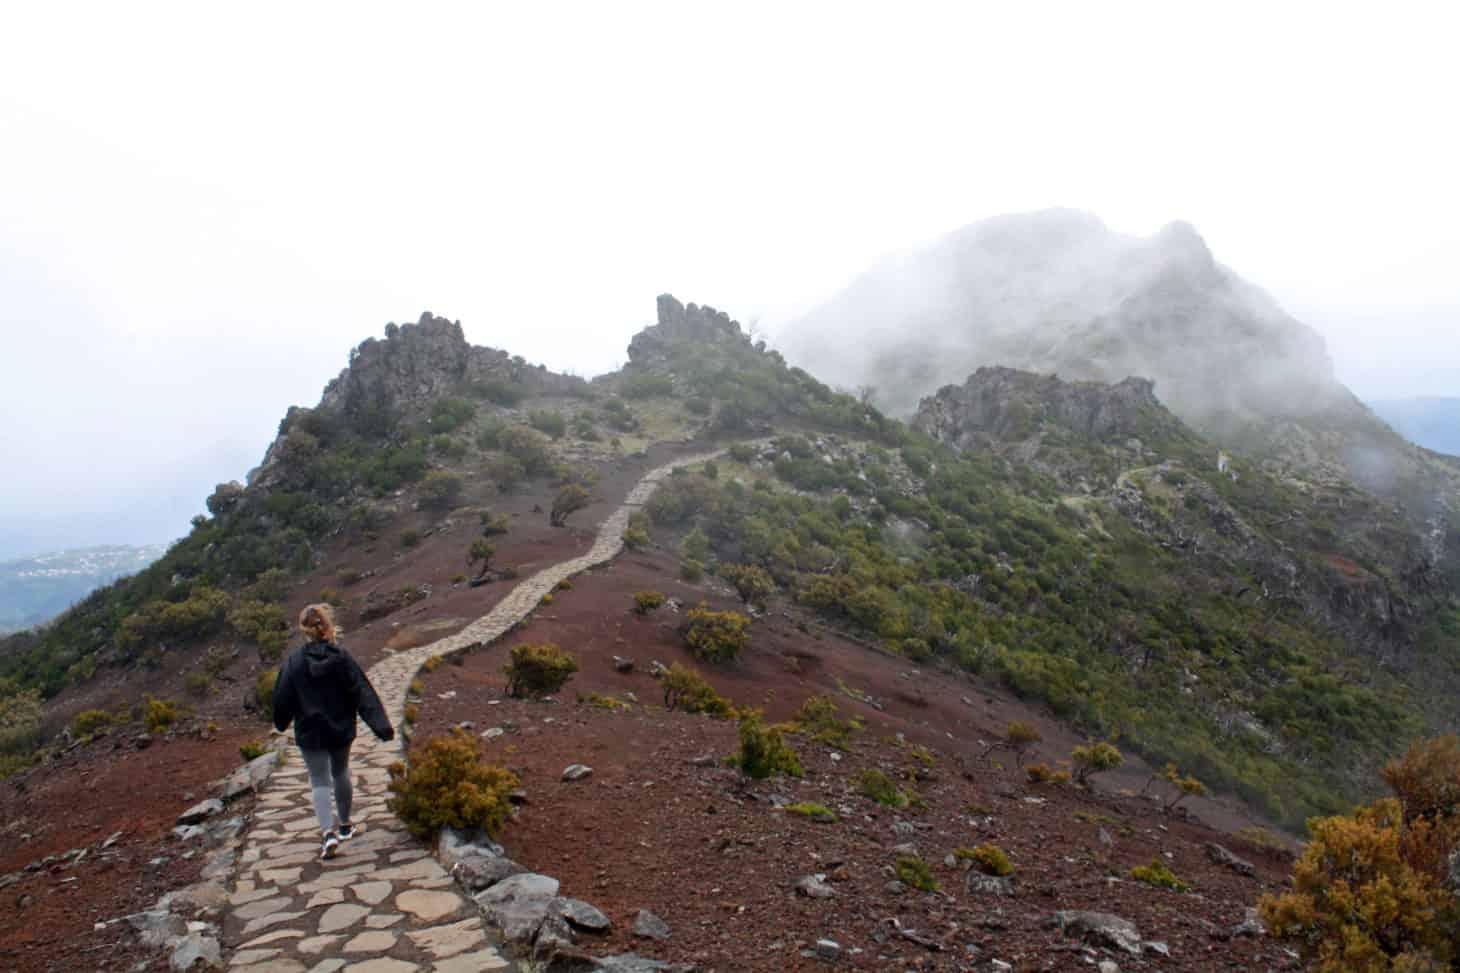 Hiking Down Pico Ruivo, Madeira